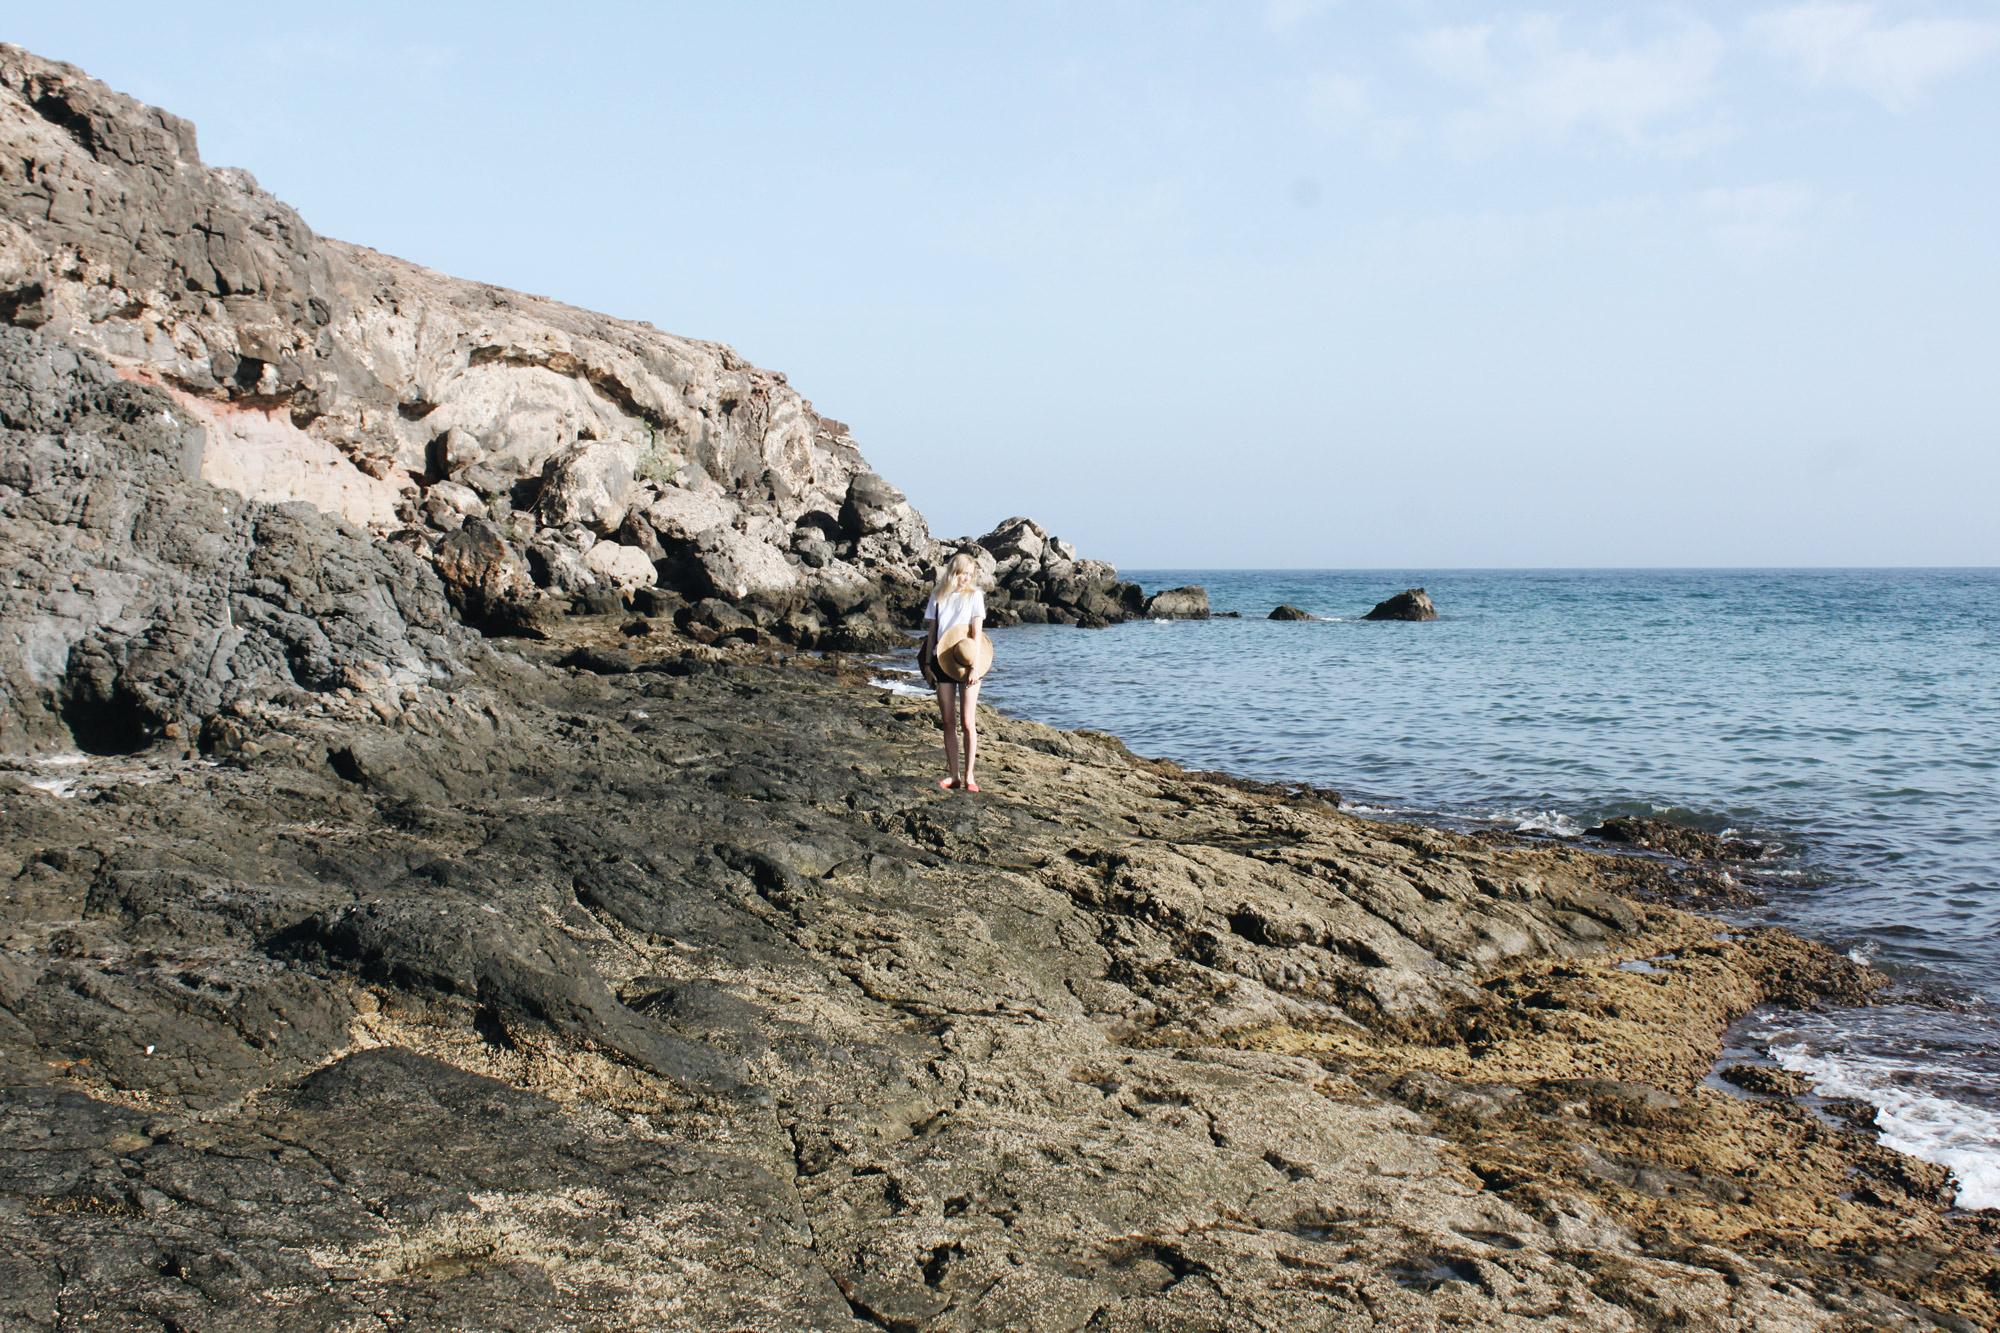 Fuerteventura beach - Canary islands